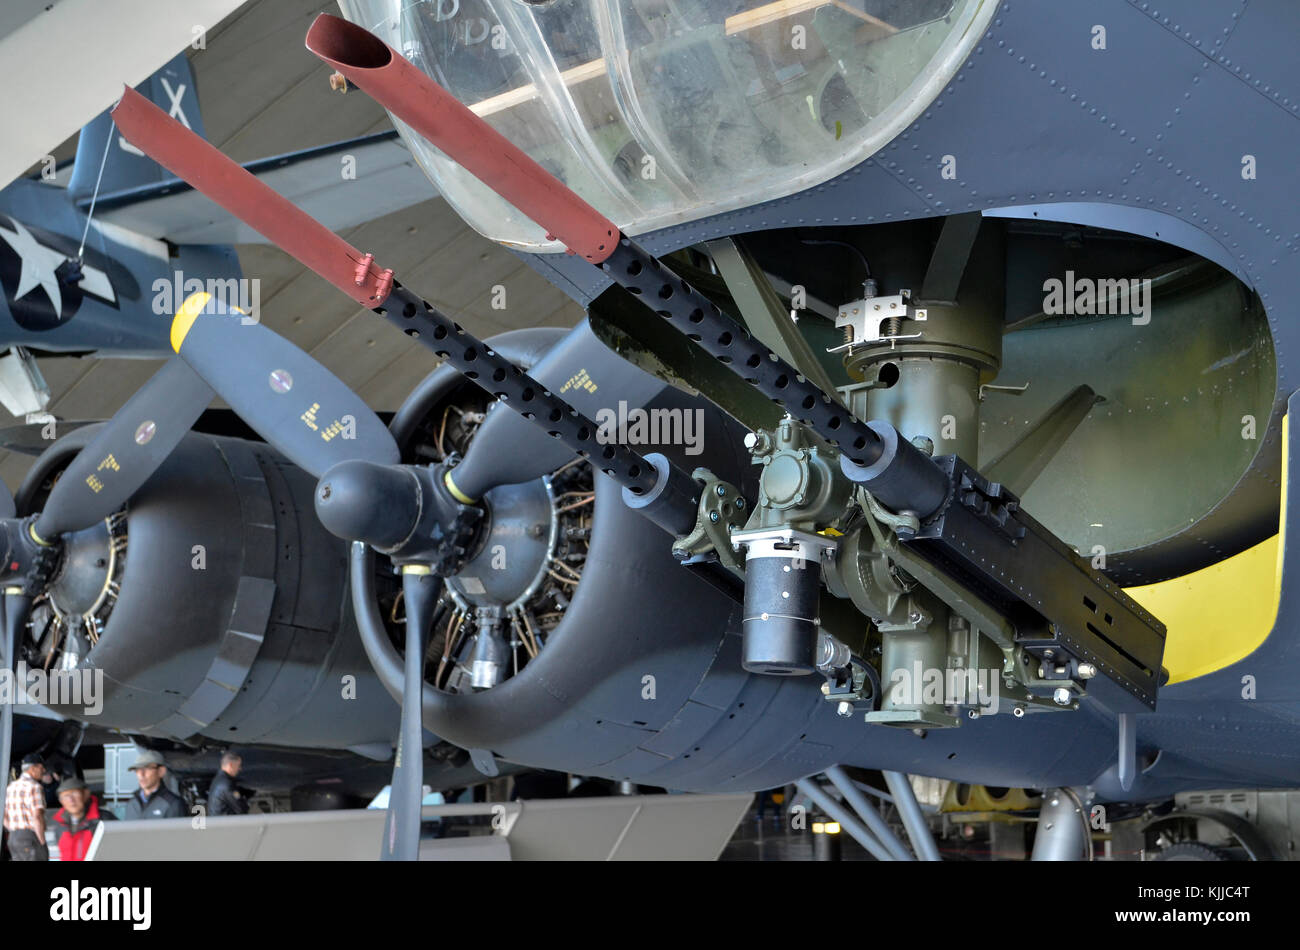 Front .50 calibre 12.7mm machine guns, B-17G Flying Fortress, American Air Museum, Duxford, UK. The machine guns - Stock Image